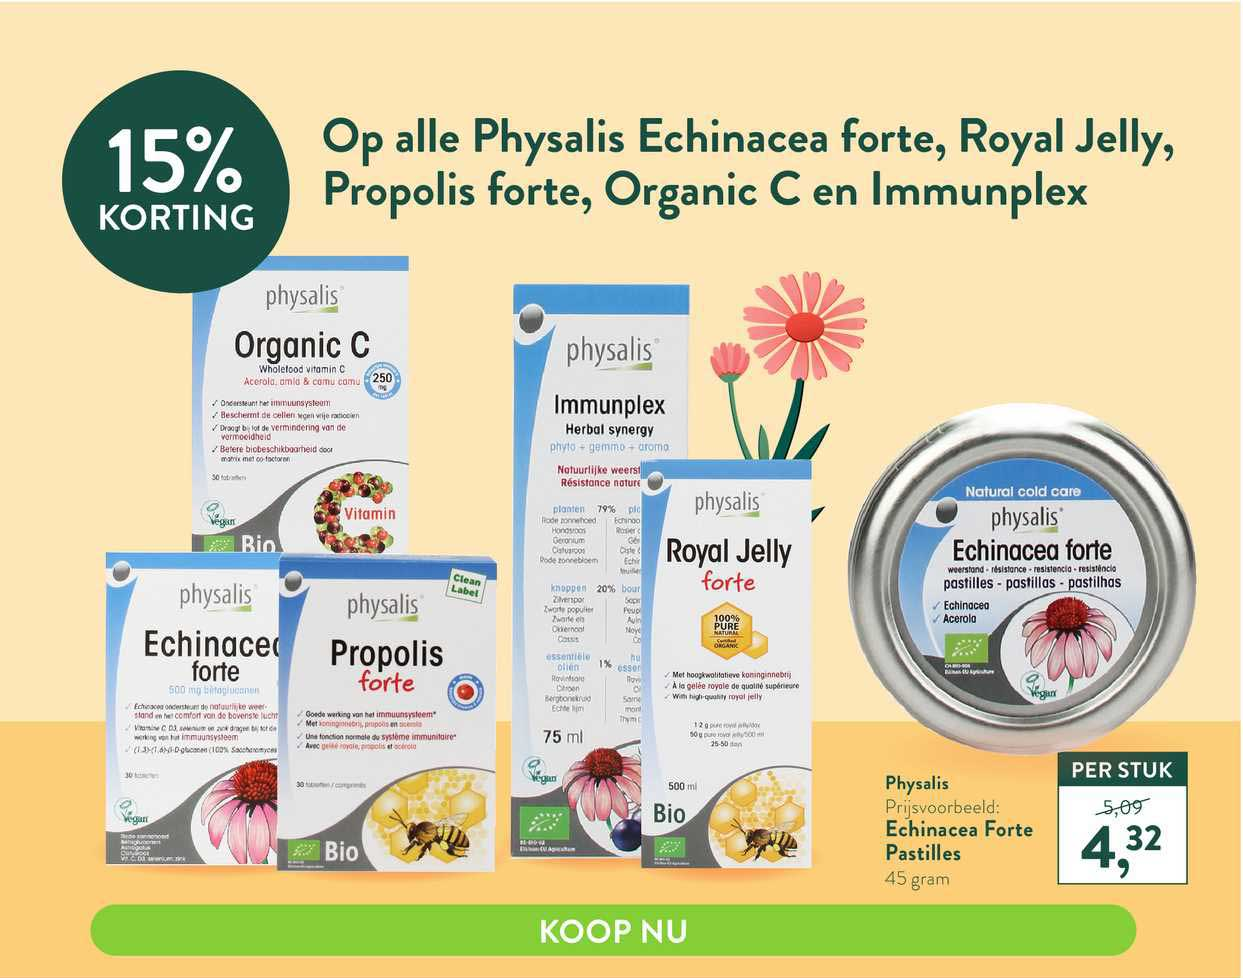 Holland & Barrett Op Alle Physalis Echinacea Forte, Royal Jelly, Propolis Forte, Organic C En Immunplex 15% Korting